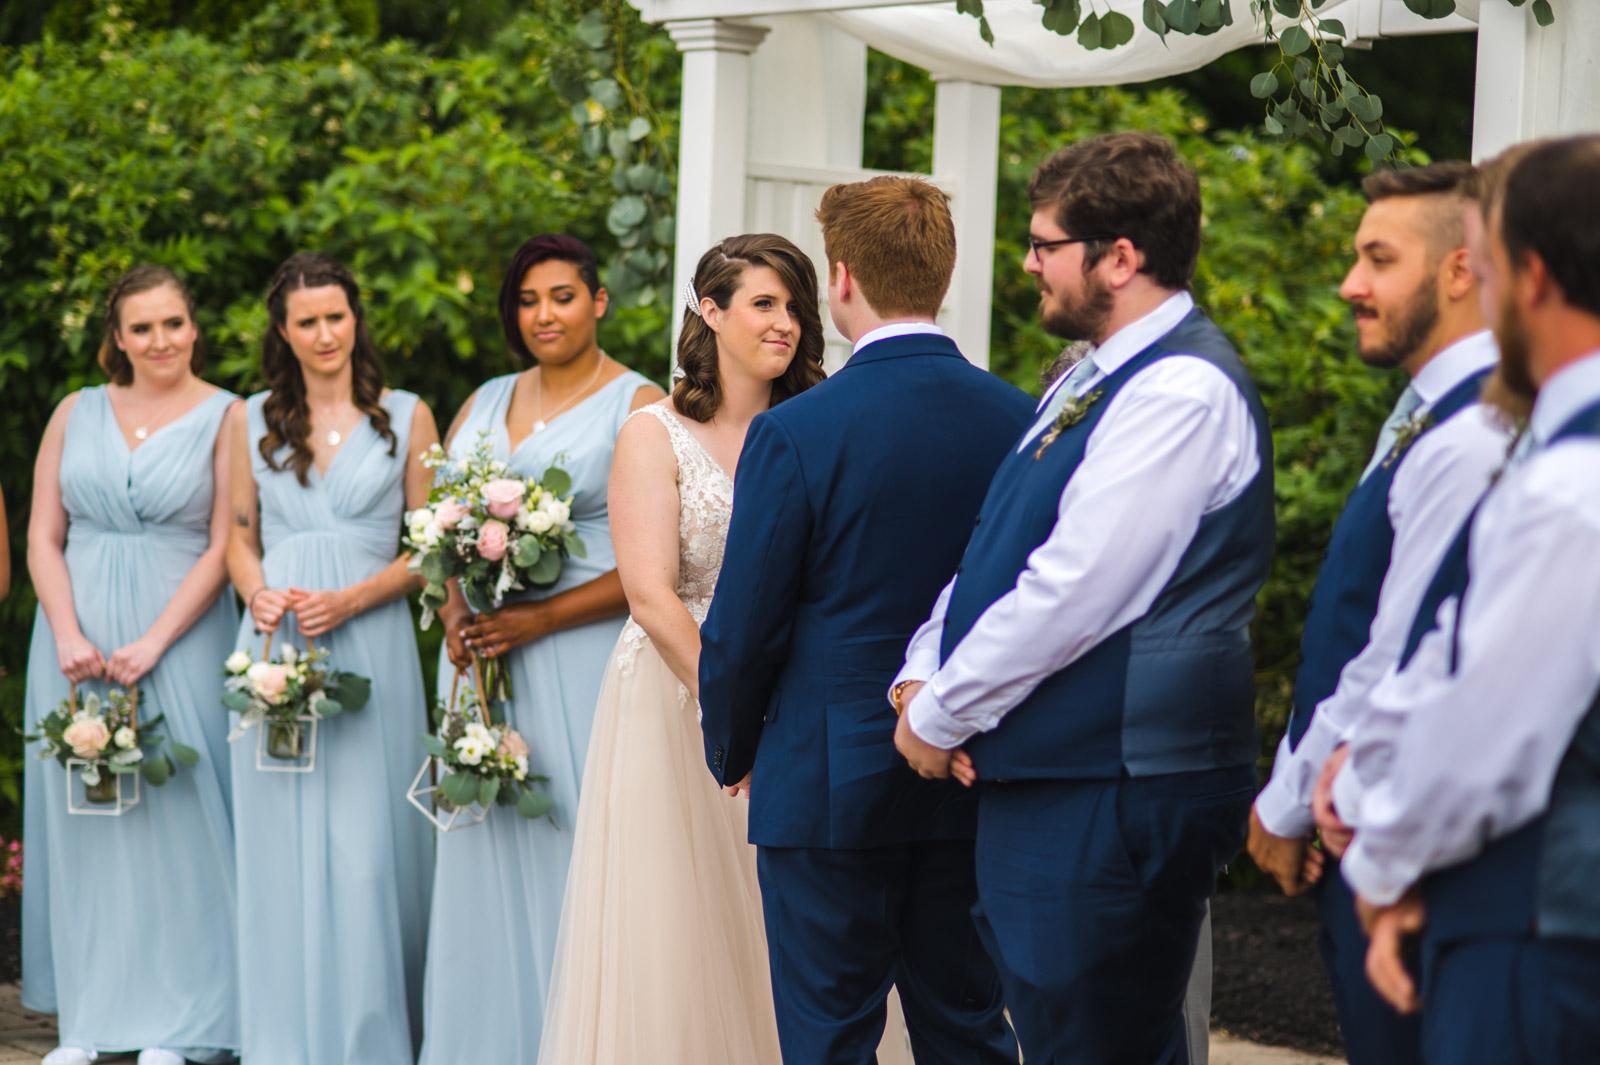 Emerson & Elicia's Golf Course Wedding Aidan & Leanne Hennebry Hamilton Wedding Videographers Photographers Niagara Hush Hush Photography & Film-19.jpg